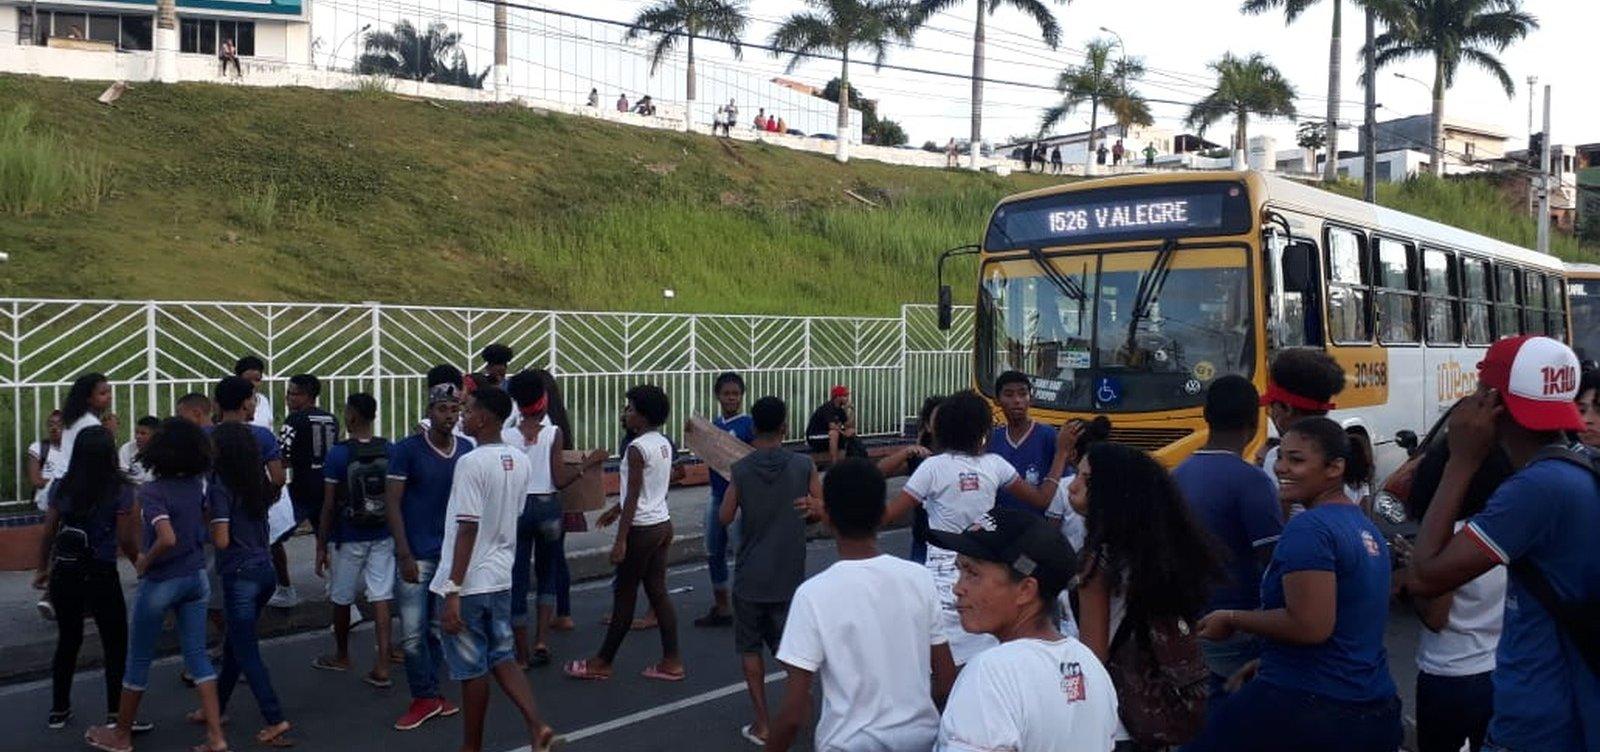 [Estudantes protestam na Avenida Suburbana contra fechamento de escola]